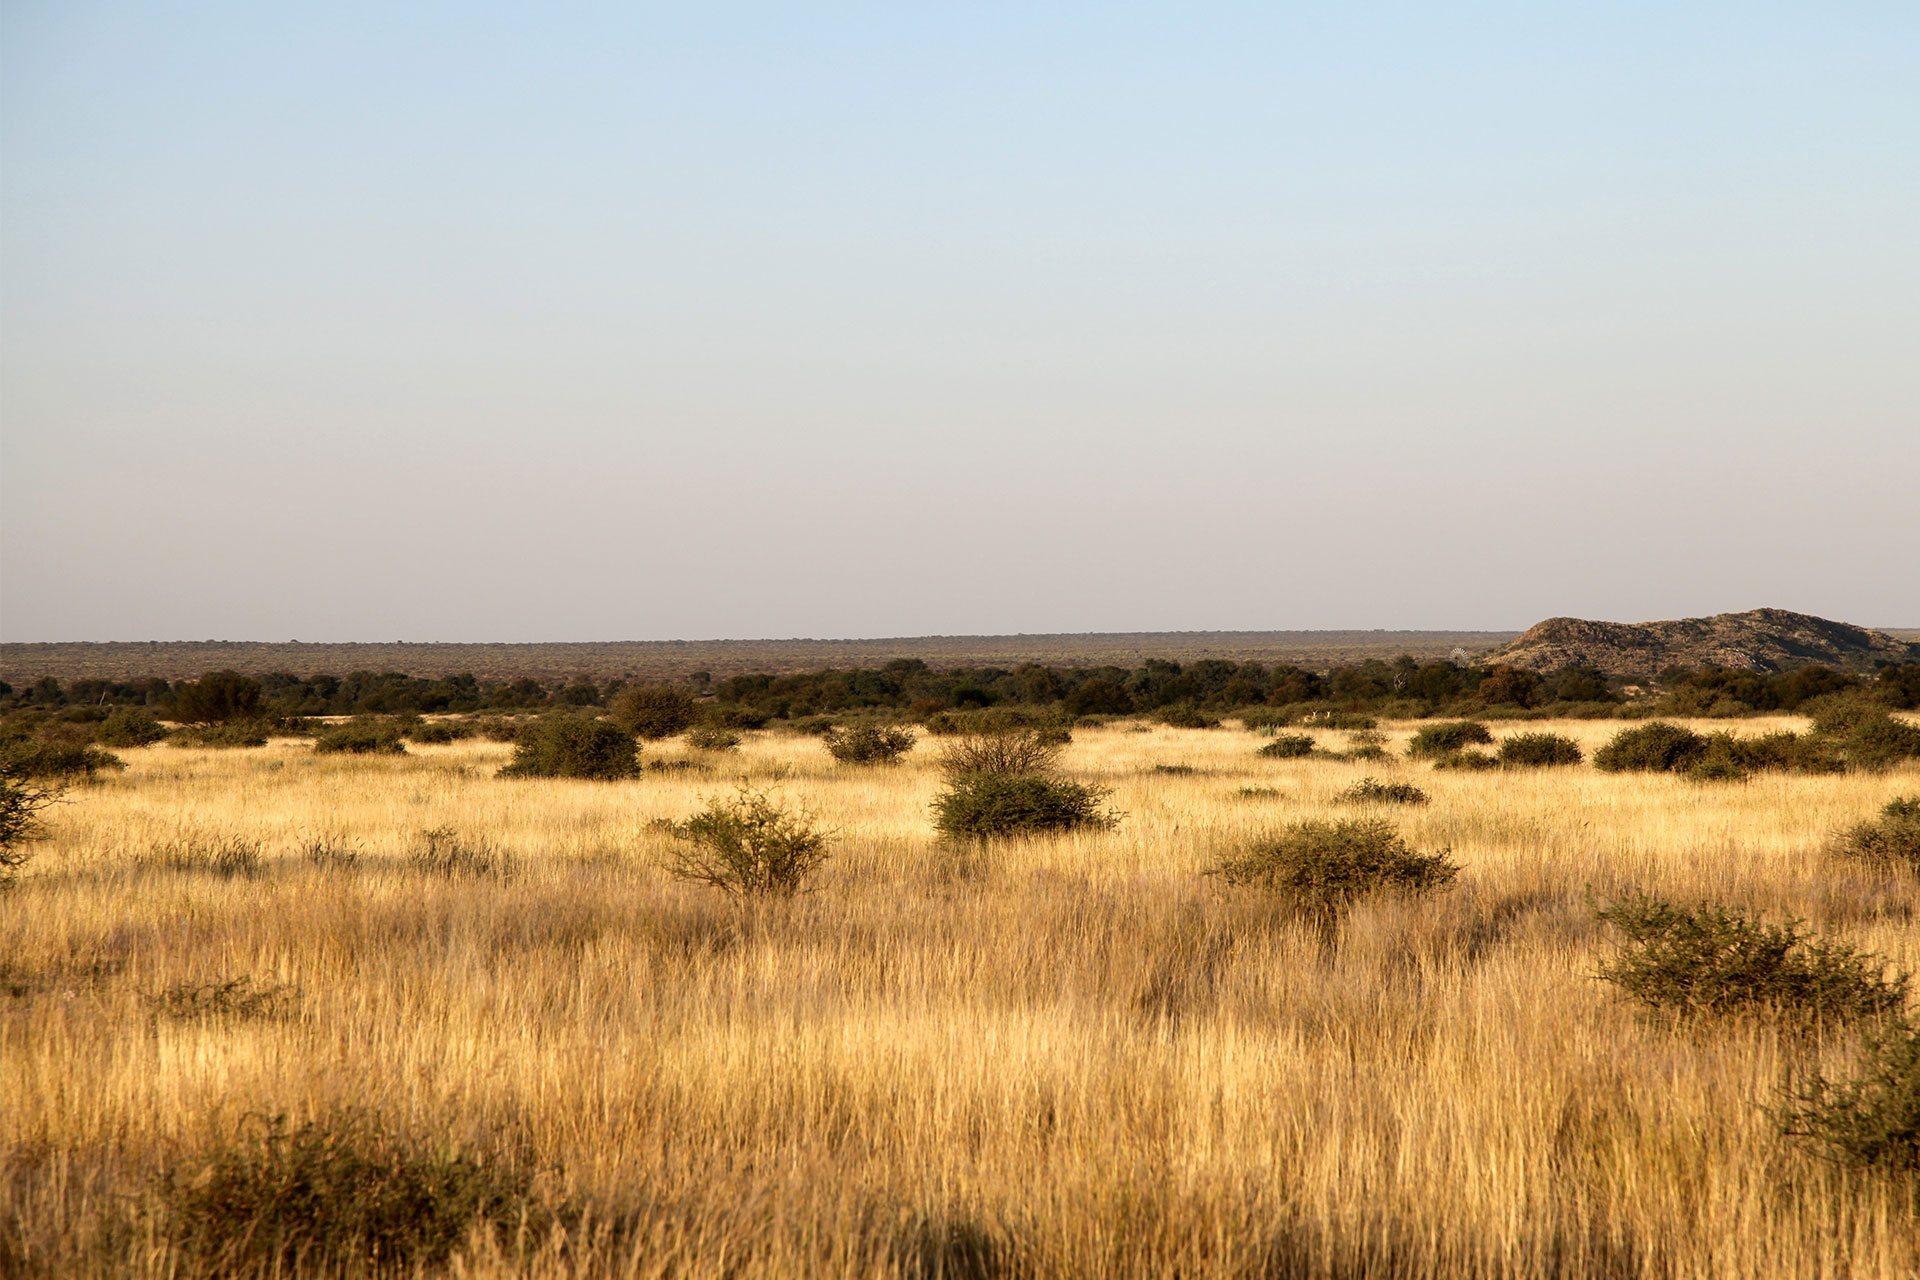 Farm in Namibia